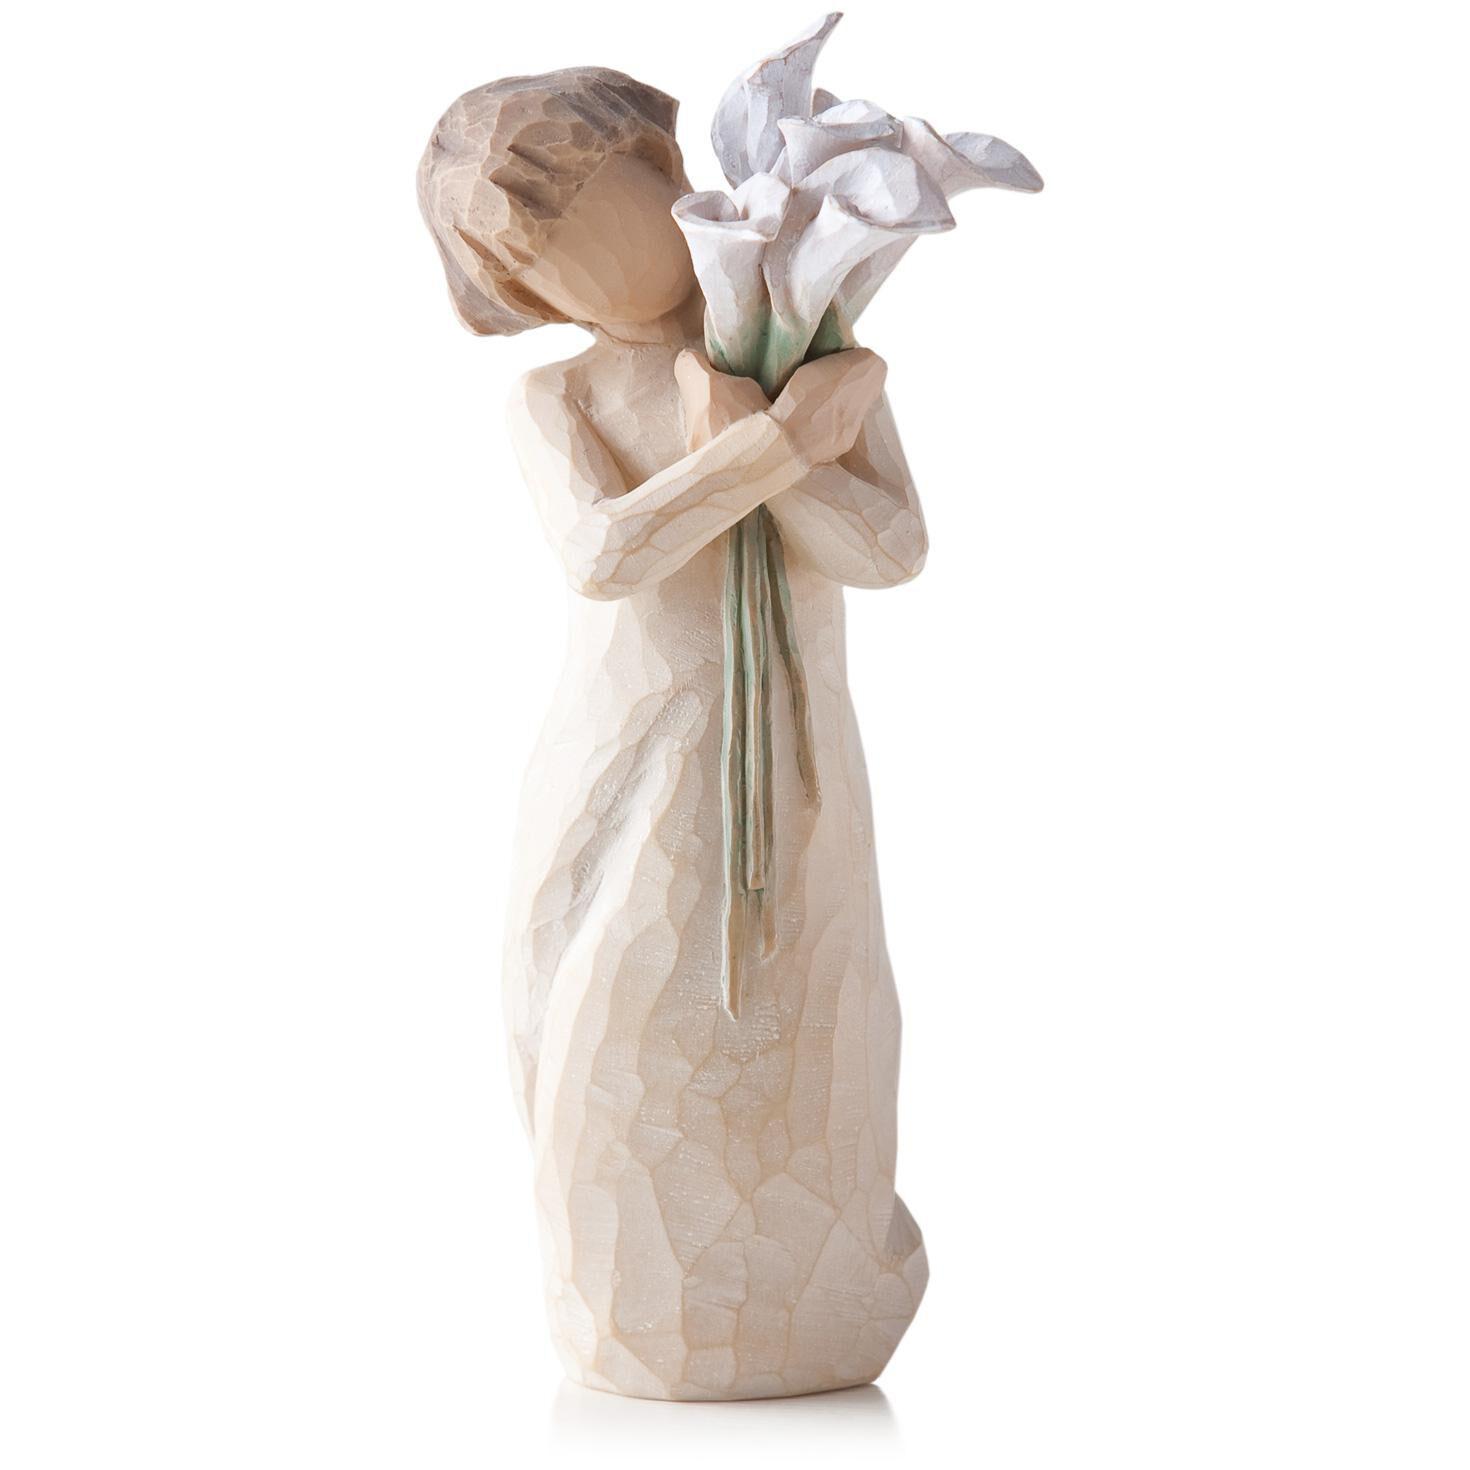 Willow Tree Beautiful Wishes Figurine Figurines Hallmark